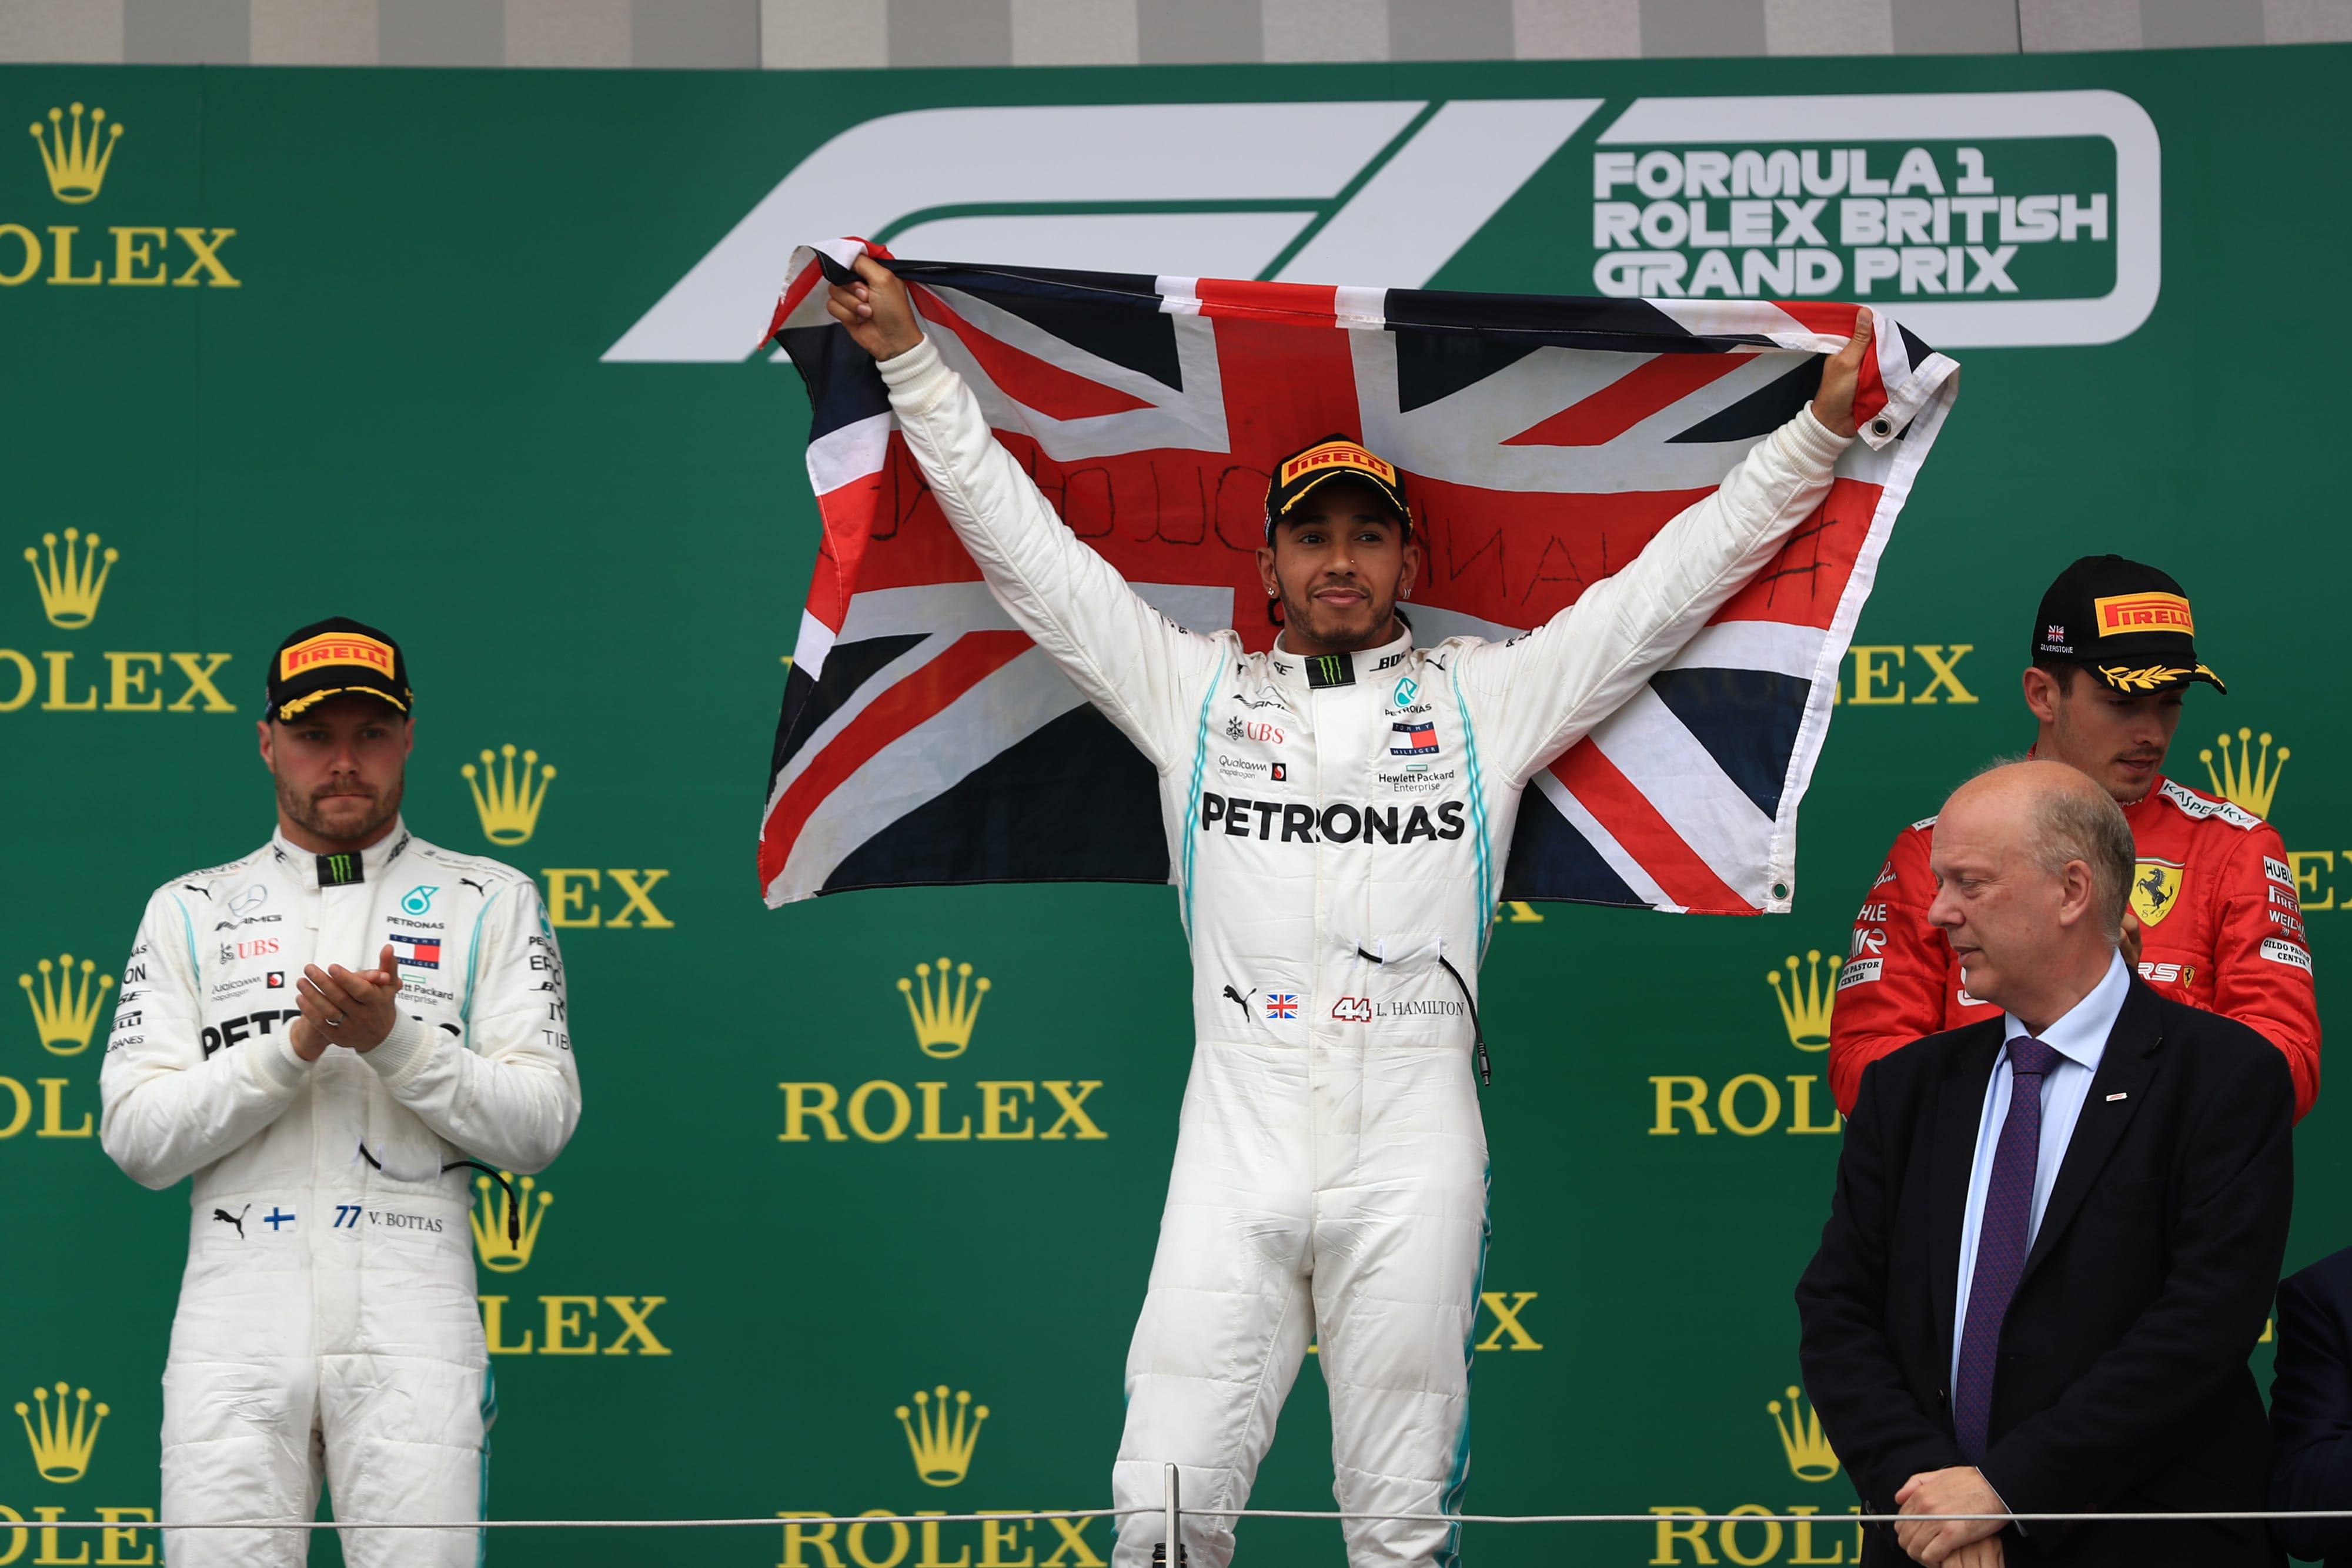 Lewis Hamilton, Valtteri Bottas & Charles Leclerc - Formula 1 - 2019 British GP